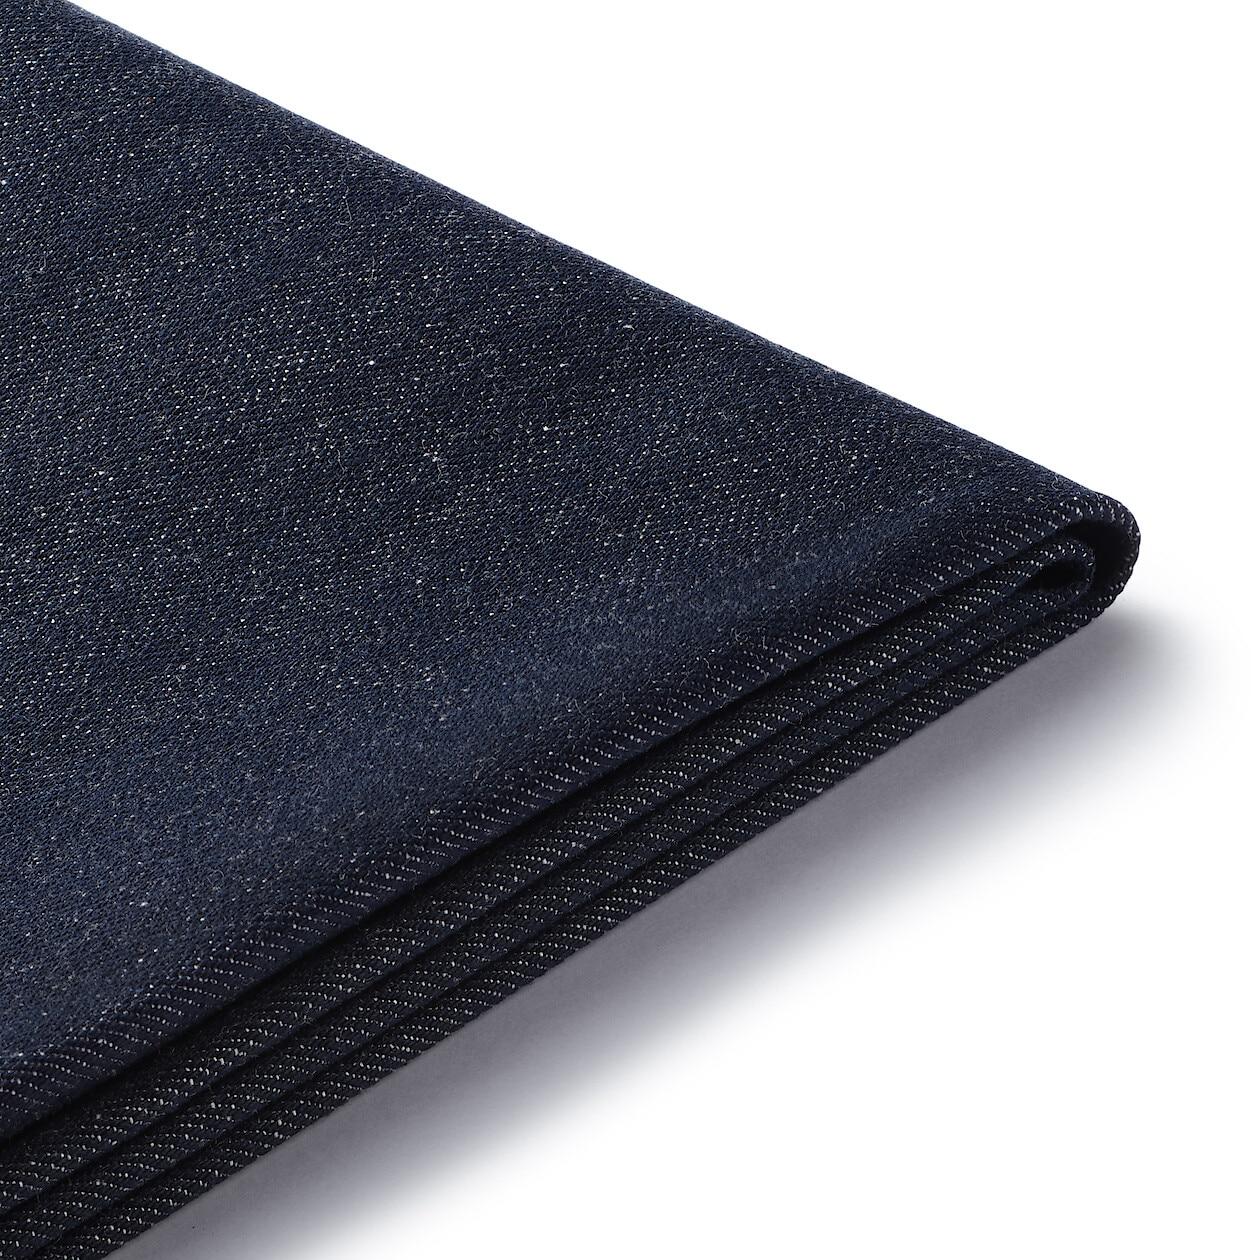 Super Cotton Denim Cover High Back Reclining Sofa 1S Navy Muji Evergreenethics Interior Chair Design Evergreenethicsorg